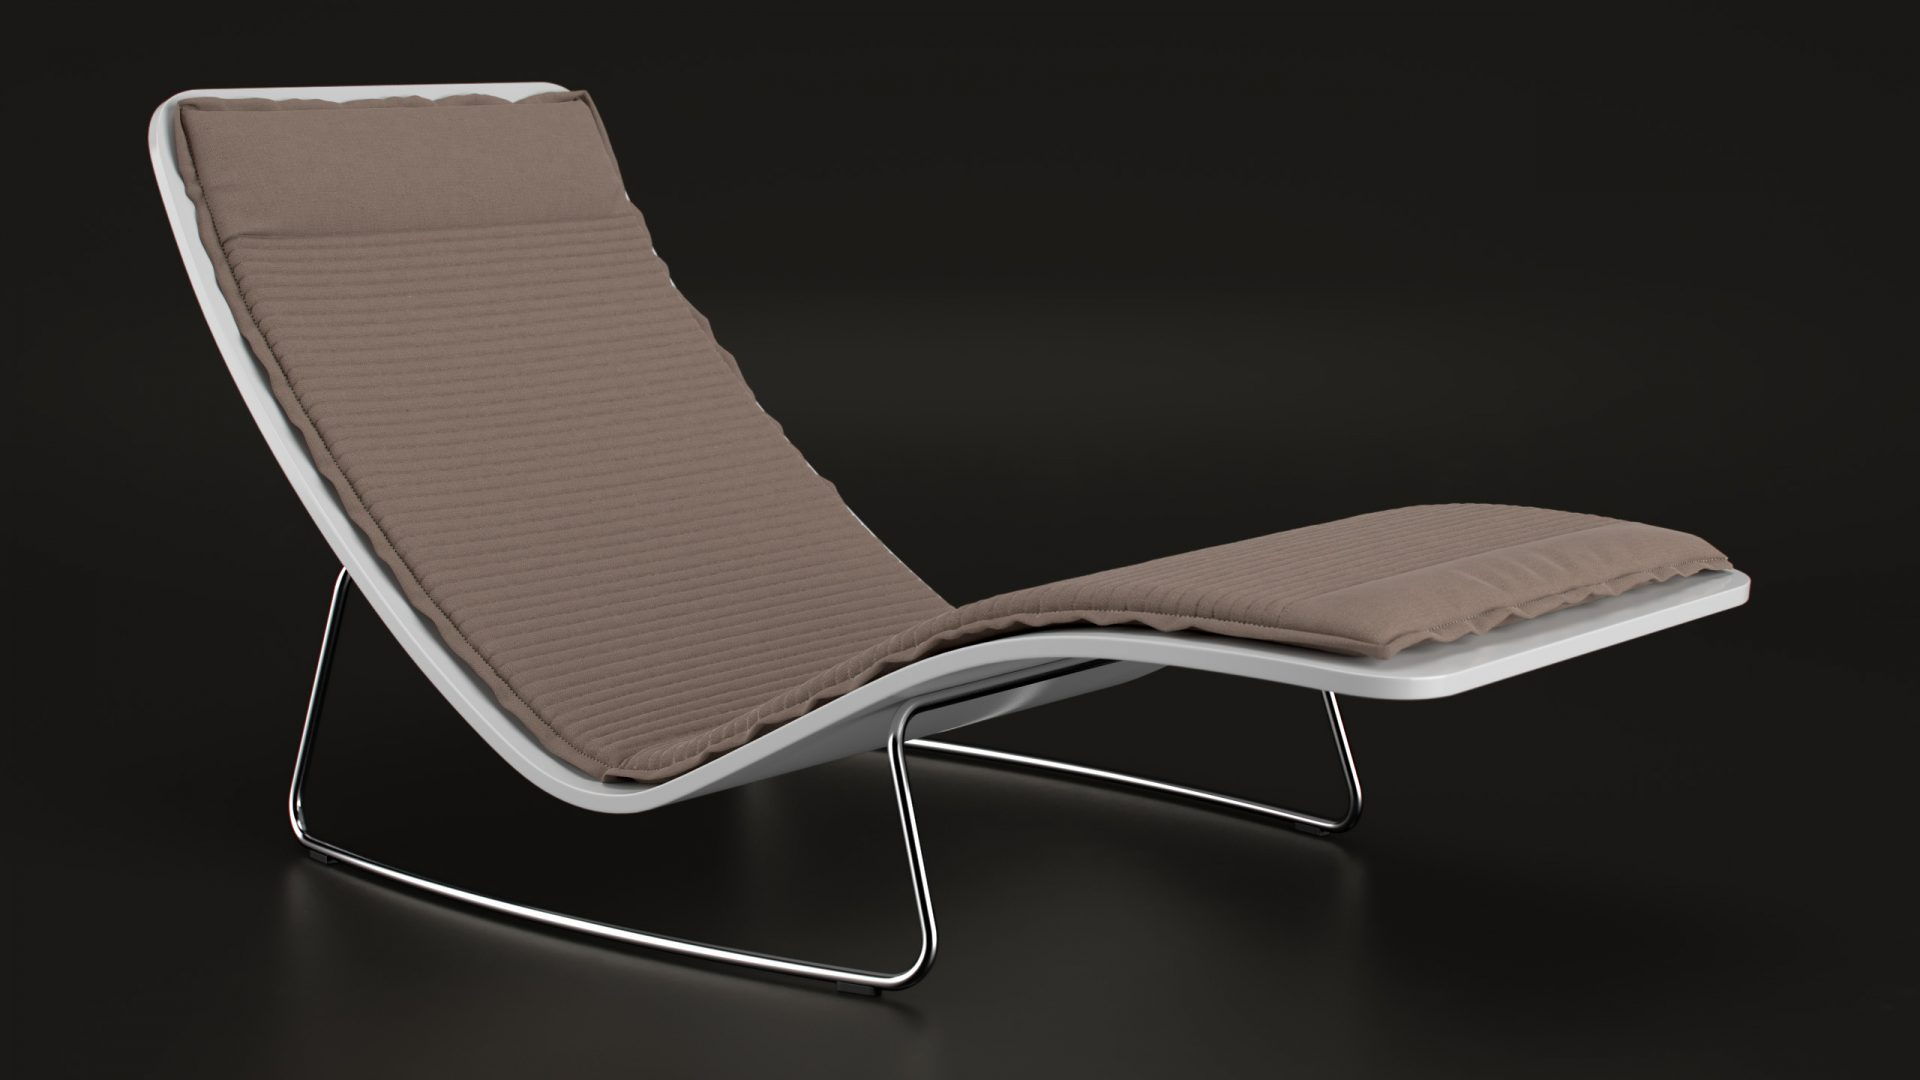 Vintage_ChaiseLounge_Couchs_001_BlackSet_01_V1.01_0000